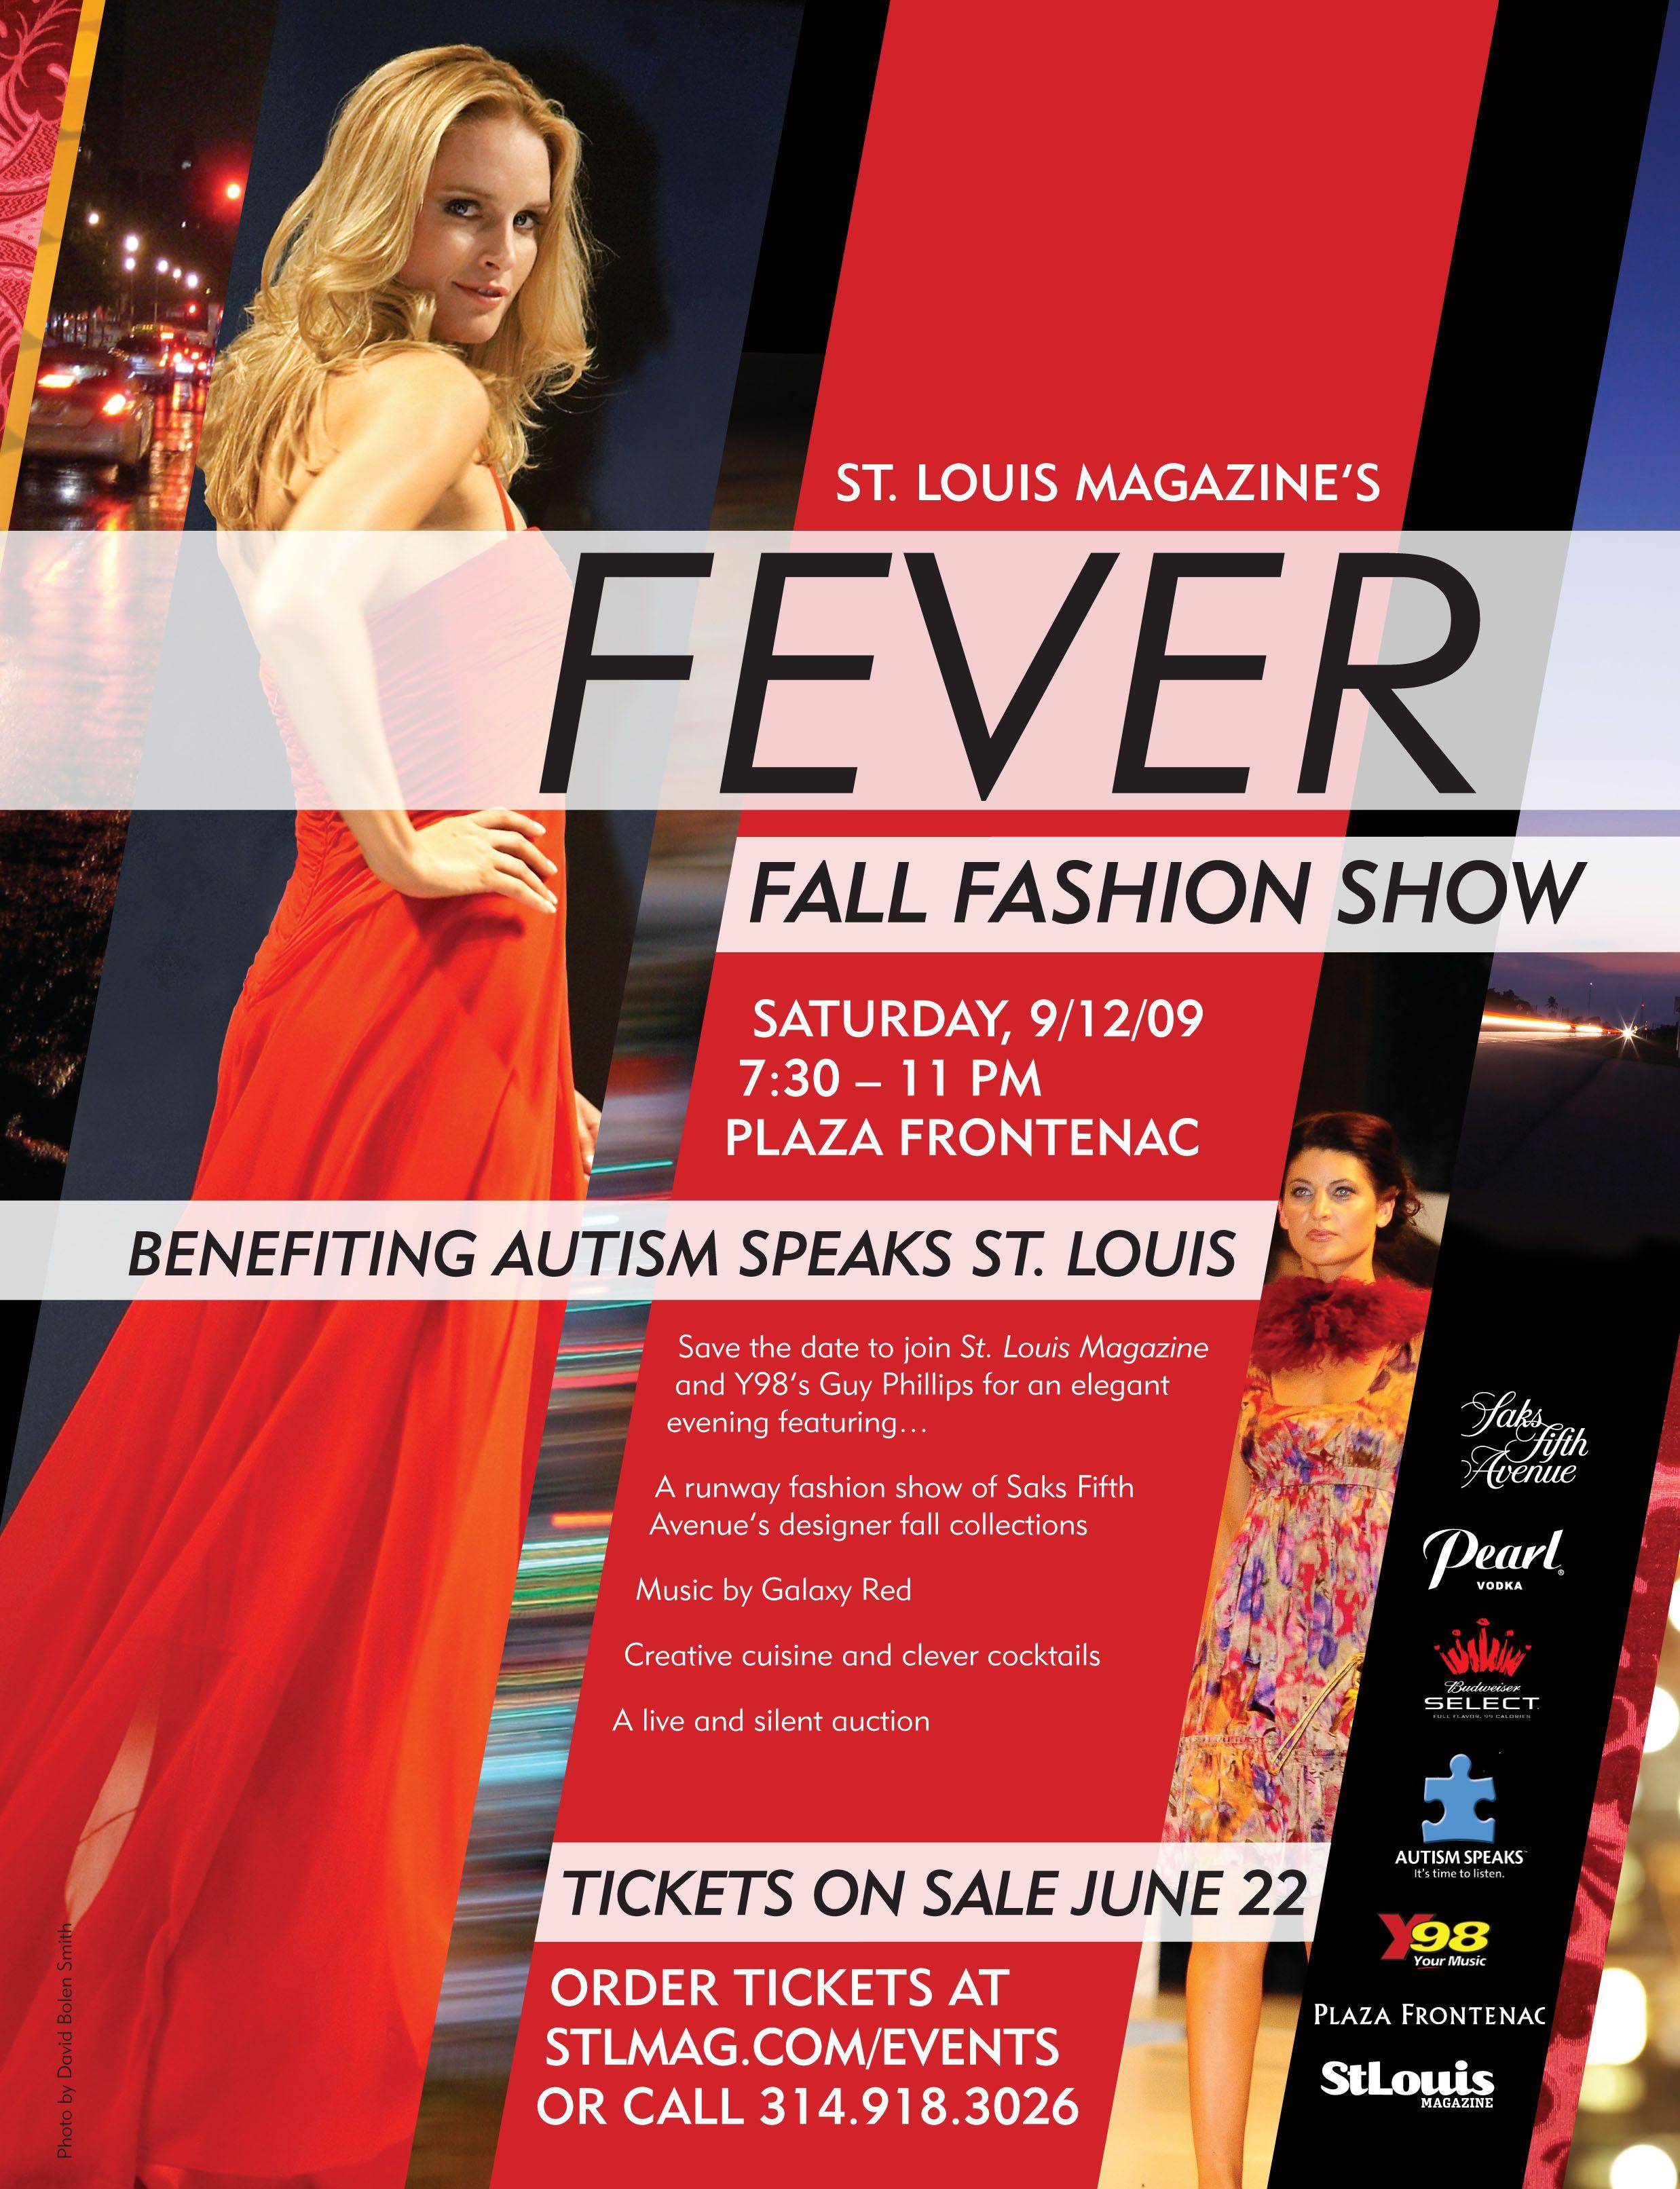 Fever Fall Fashion Show advertisement | Fashion show ...